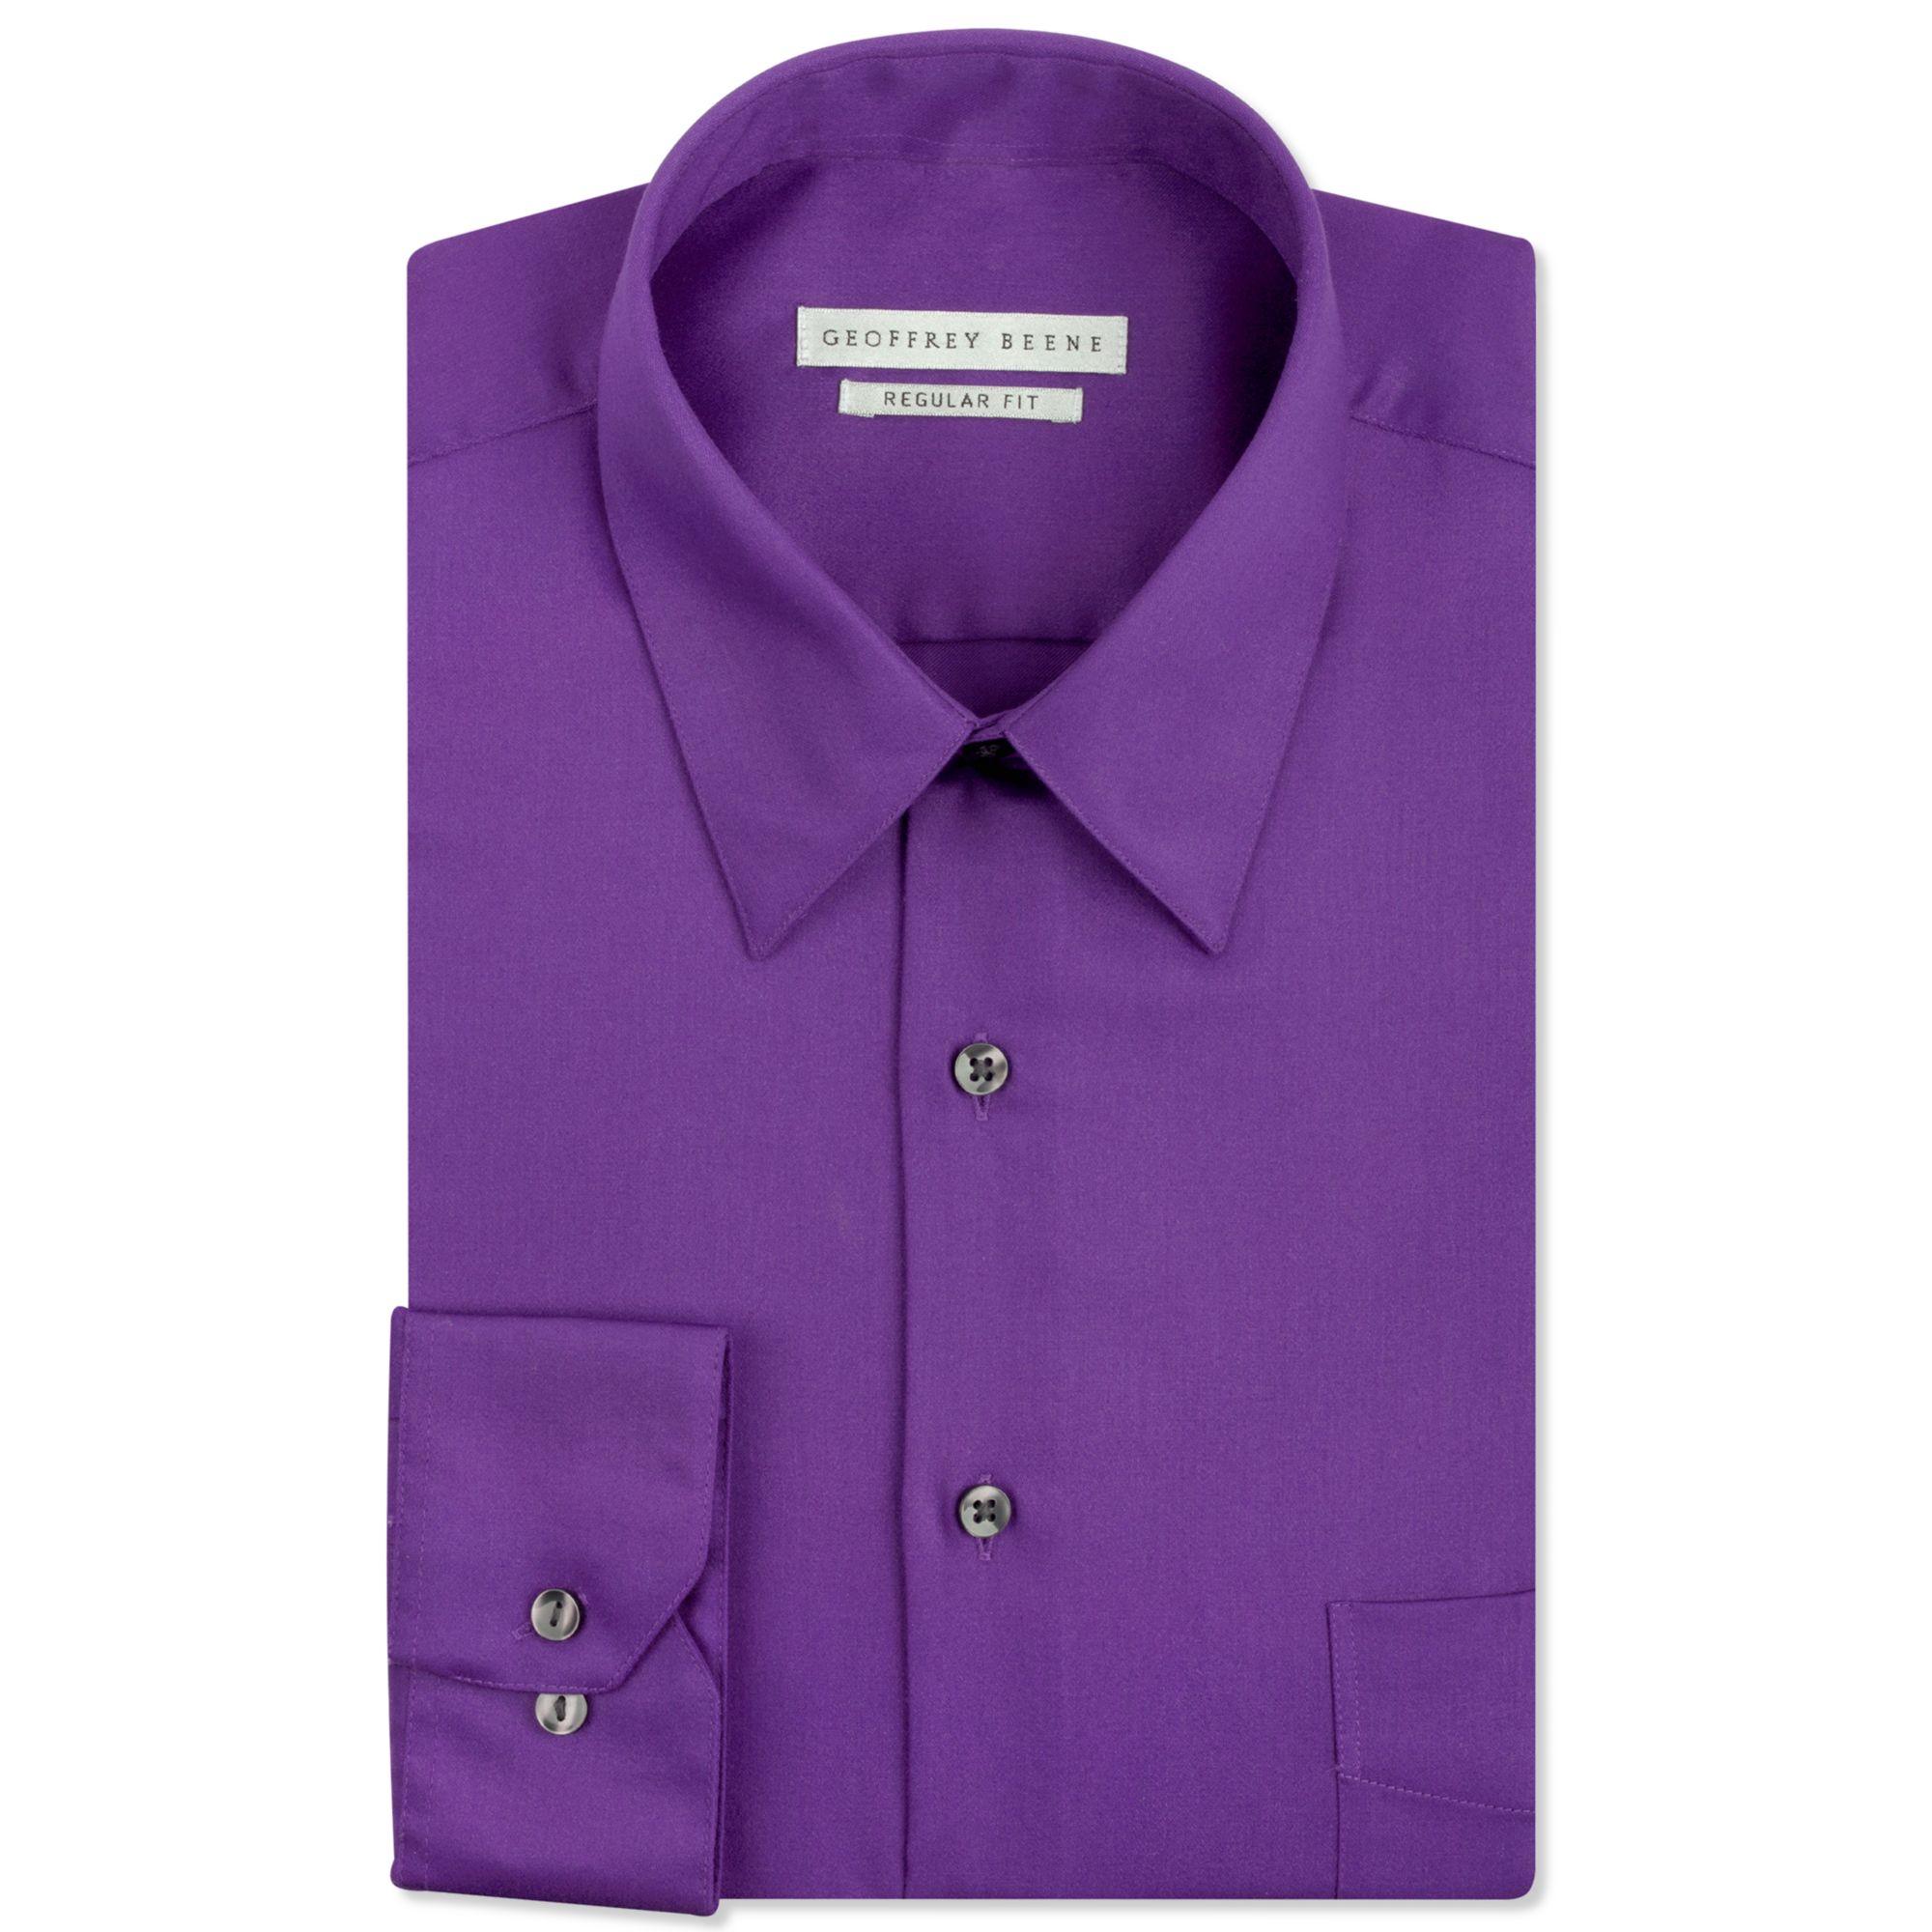 8b92e6d4518 Geoffrey Beene Pinpoint Fitted Dress Shirts Button Down - DREAMWORKS